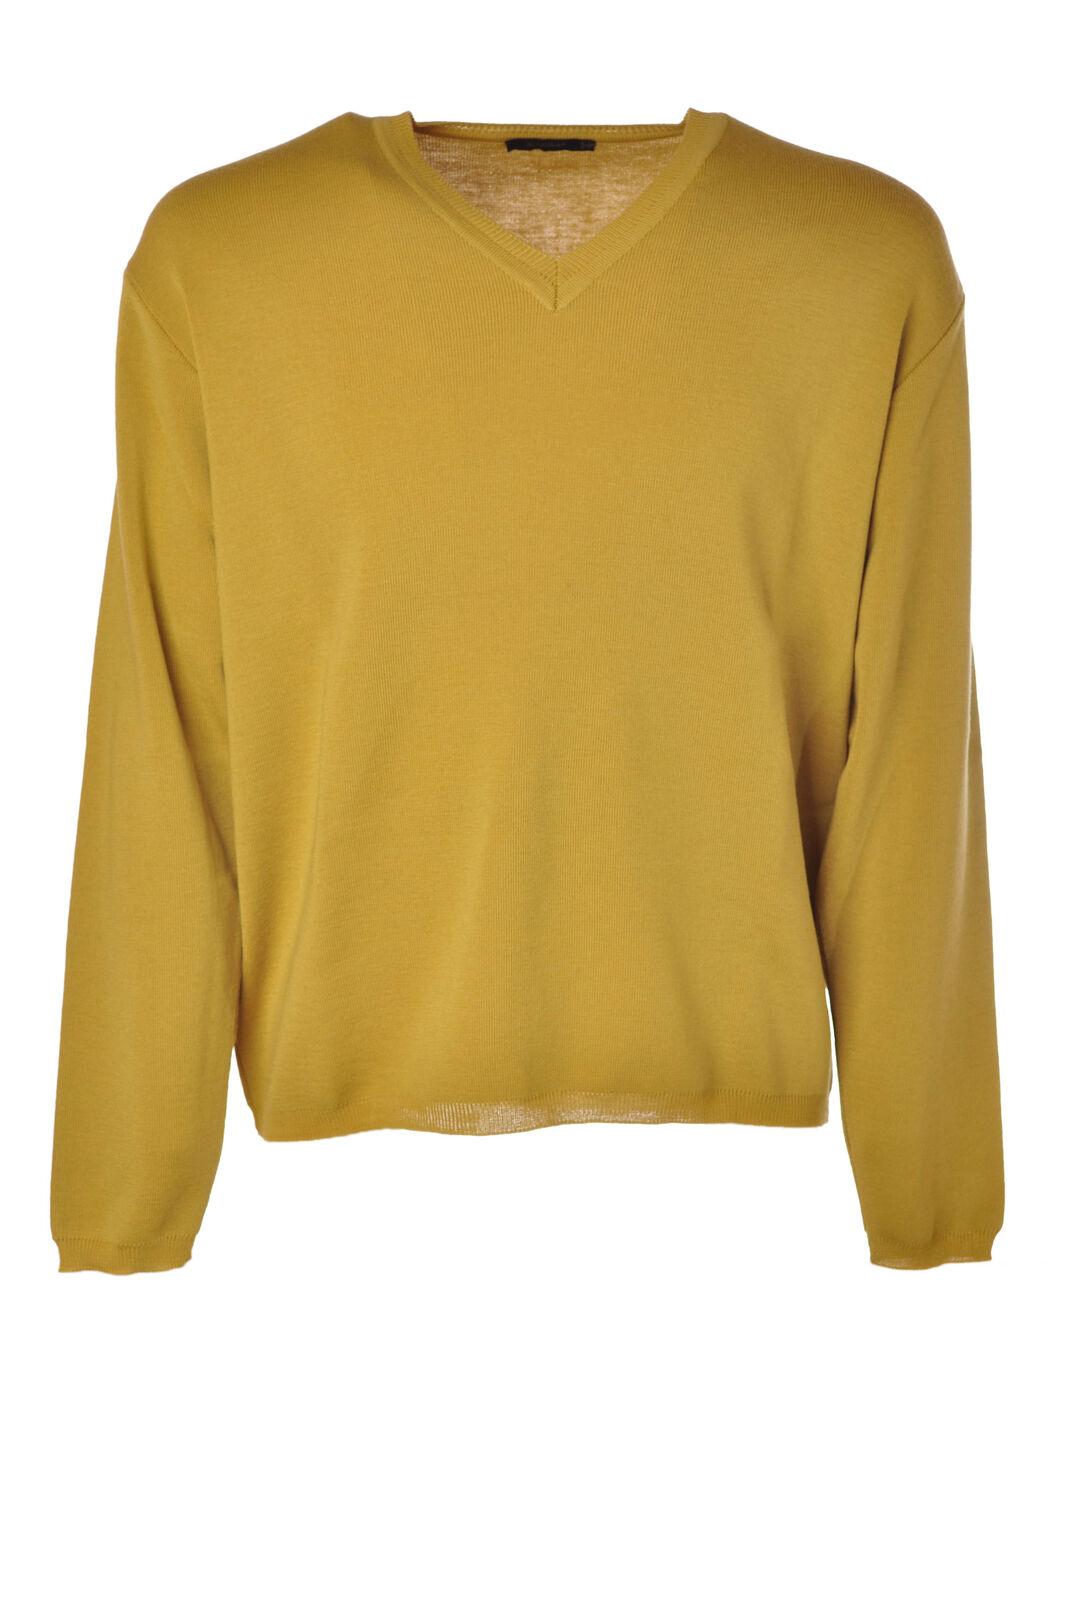 Almeria  -  Sweaters - Male - Yellow - 2834831N174058